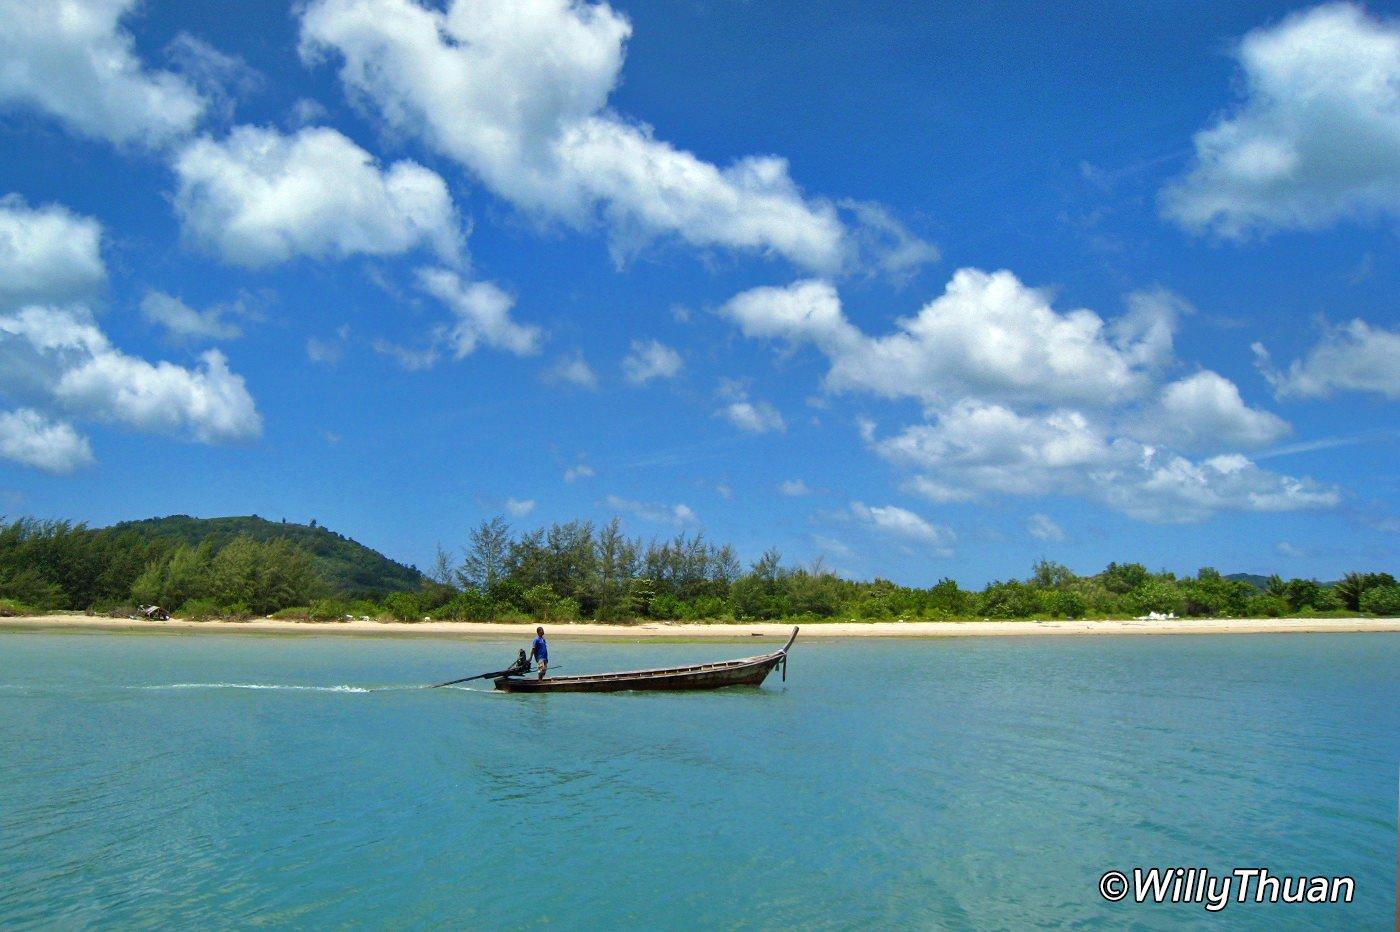 Suvit Raft